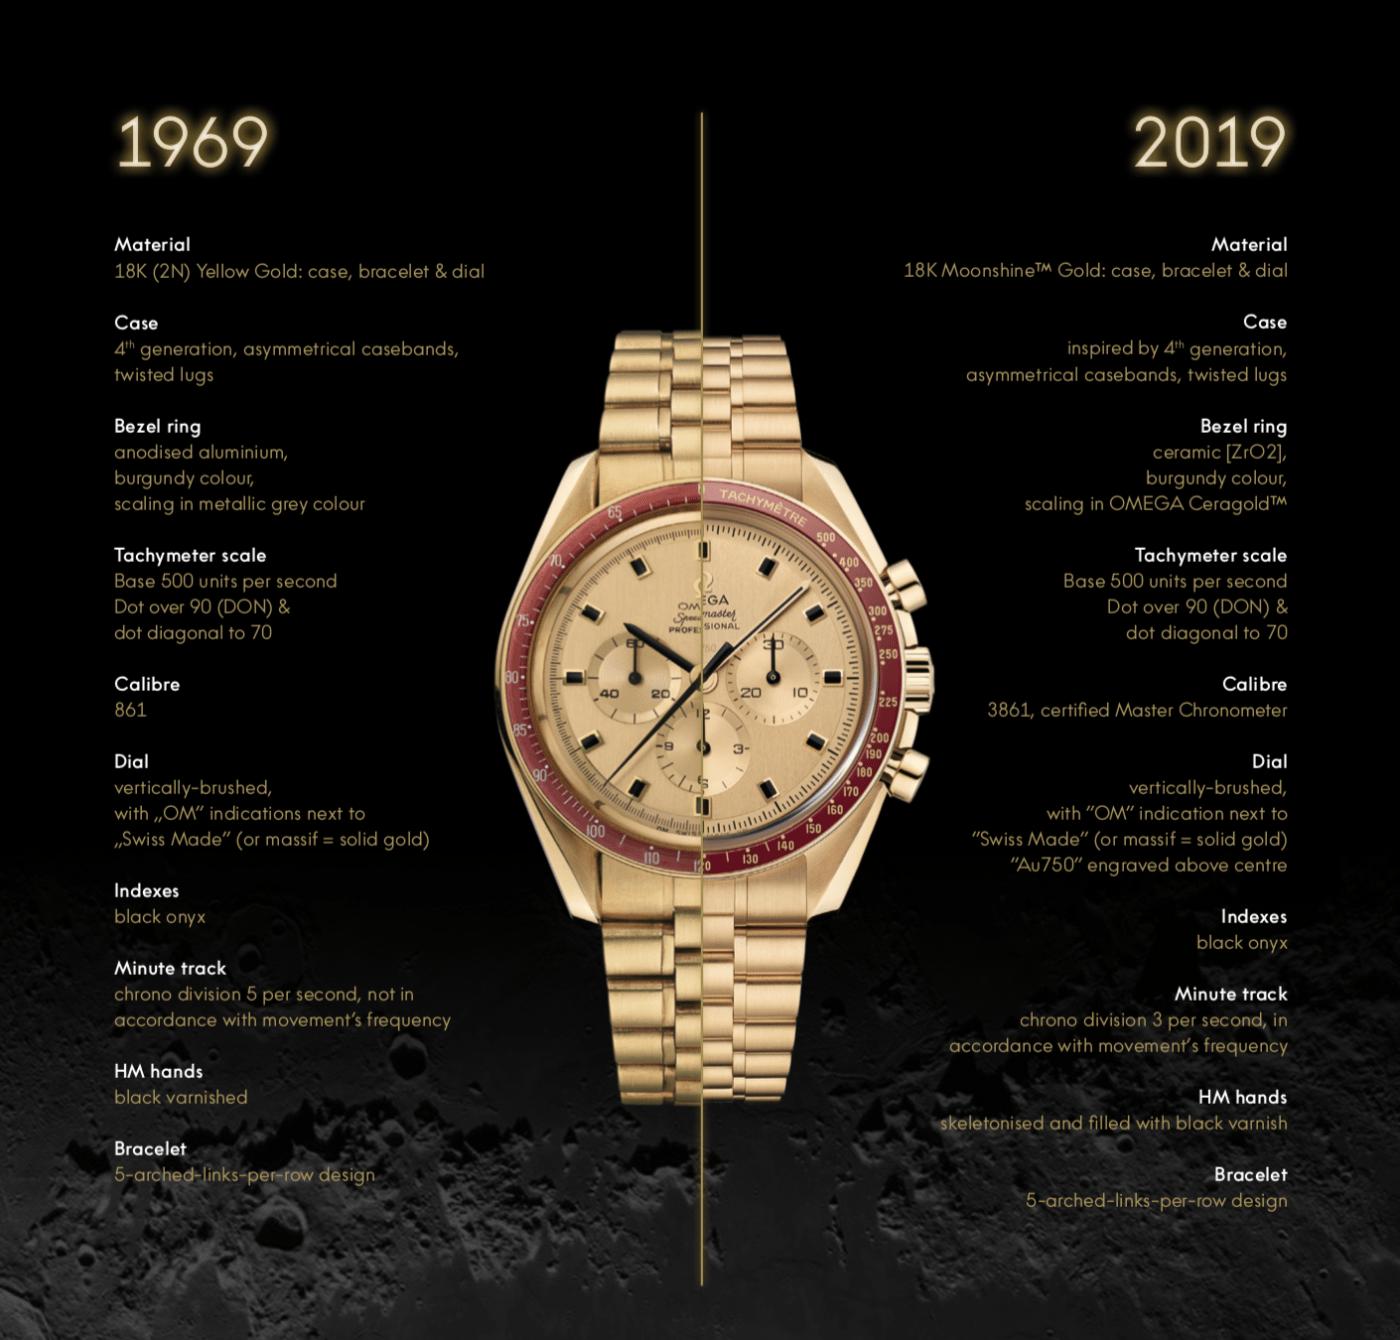 Speedmaster Apollo 11 50th Anniversary Limited Edition BA145.022